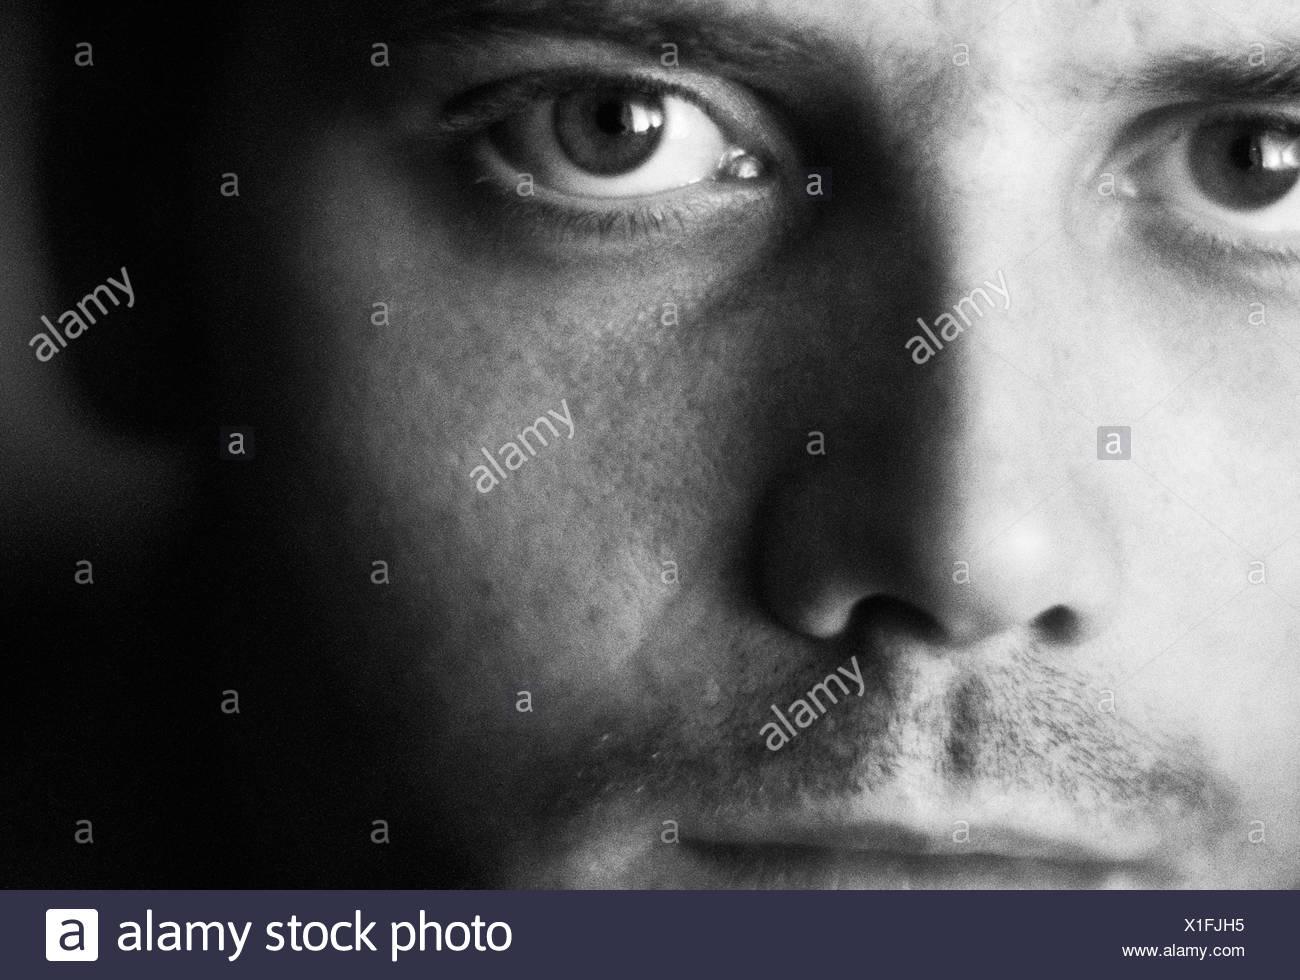 A man close-up Sweden - Stock Image